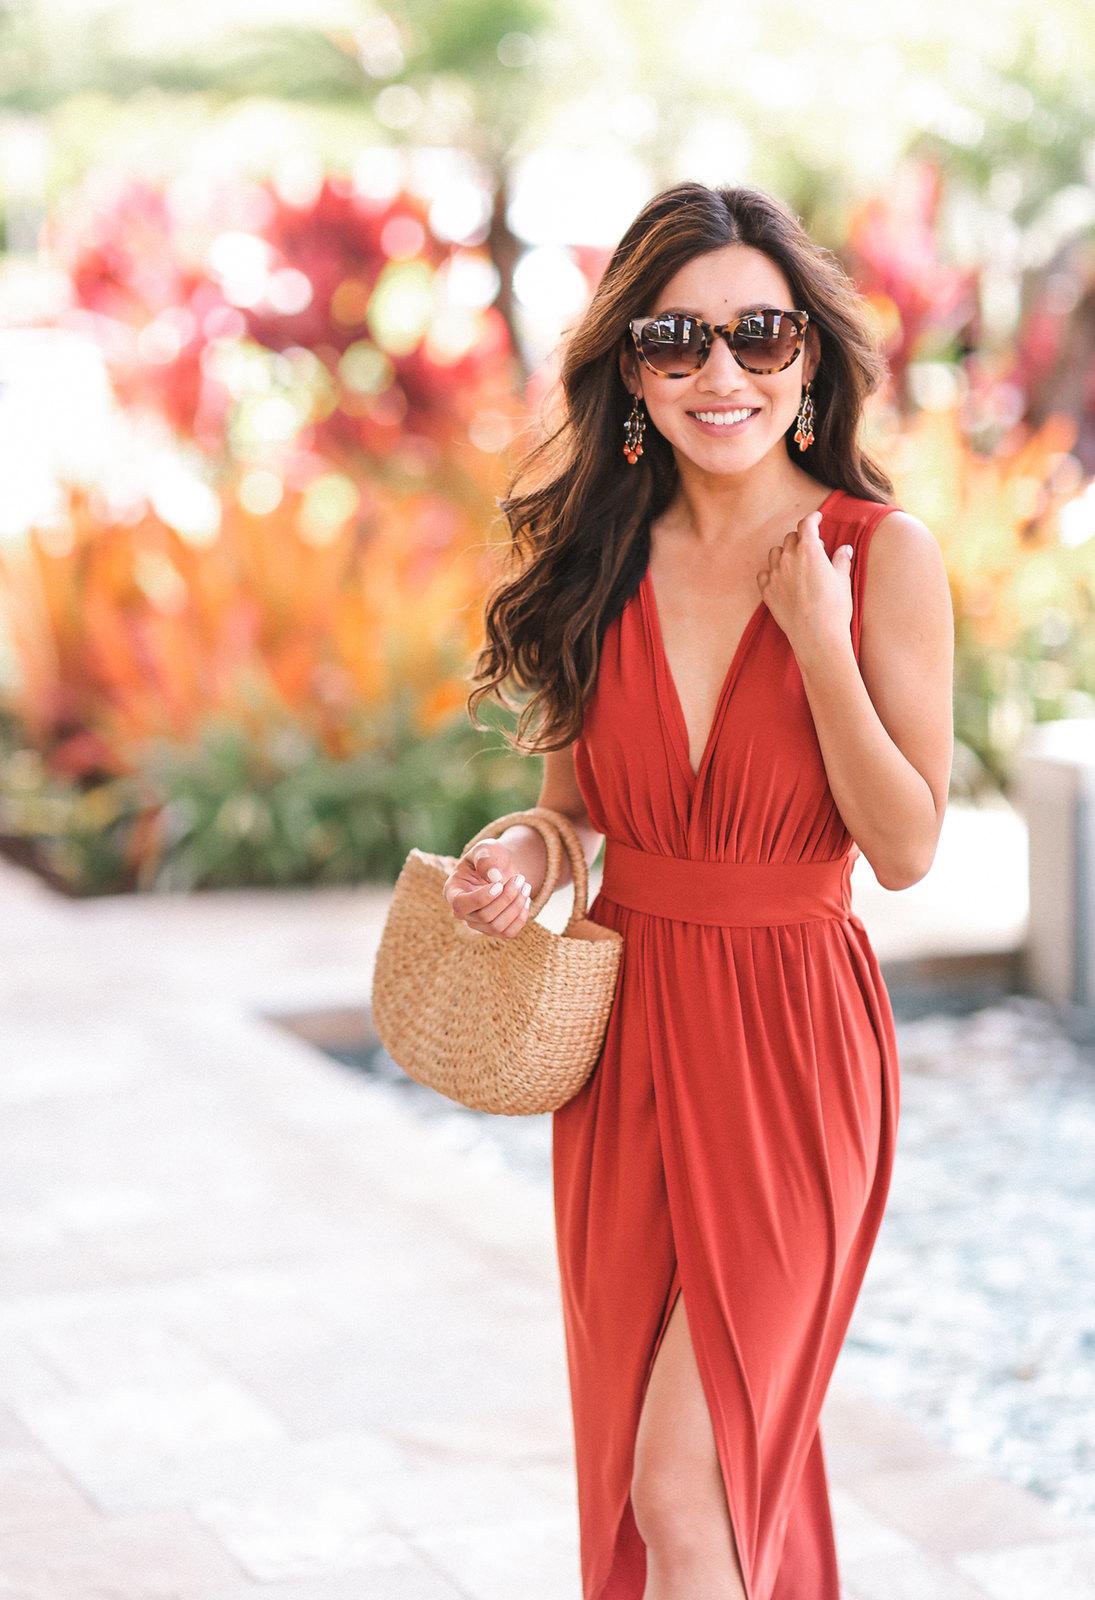 maui hawaii honeymoon vacation resort dress outfit